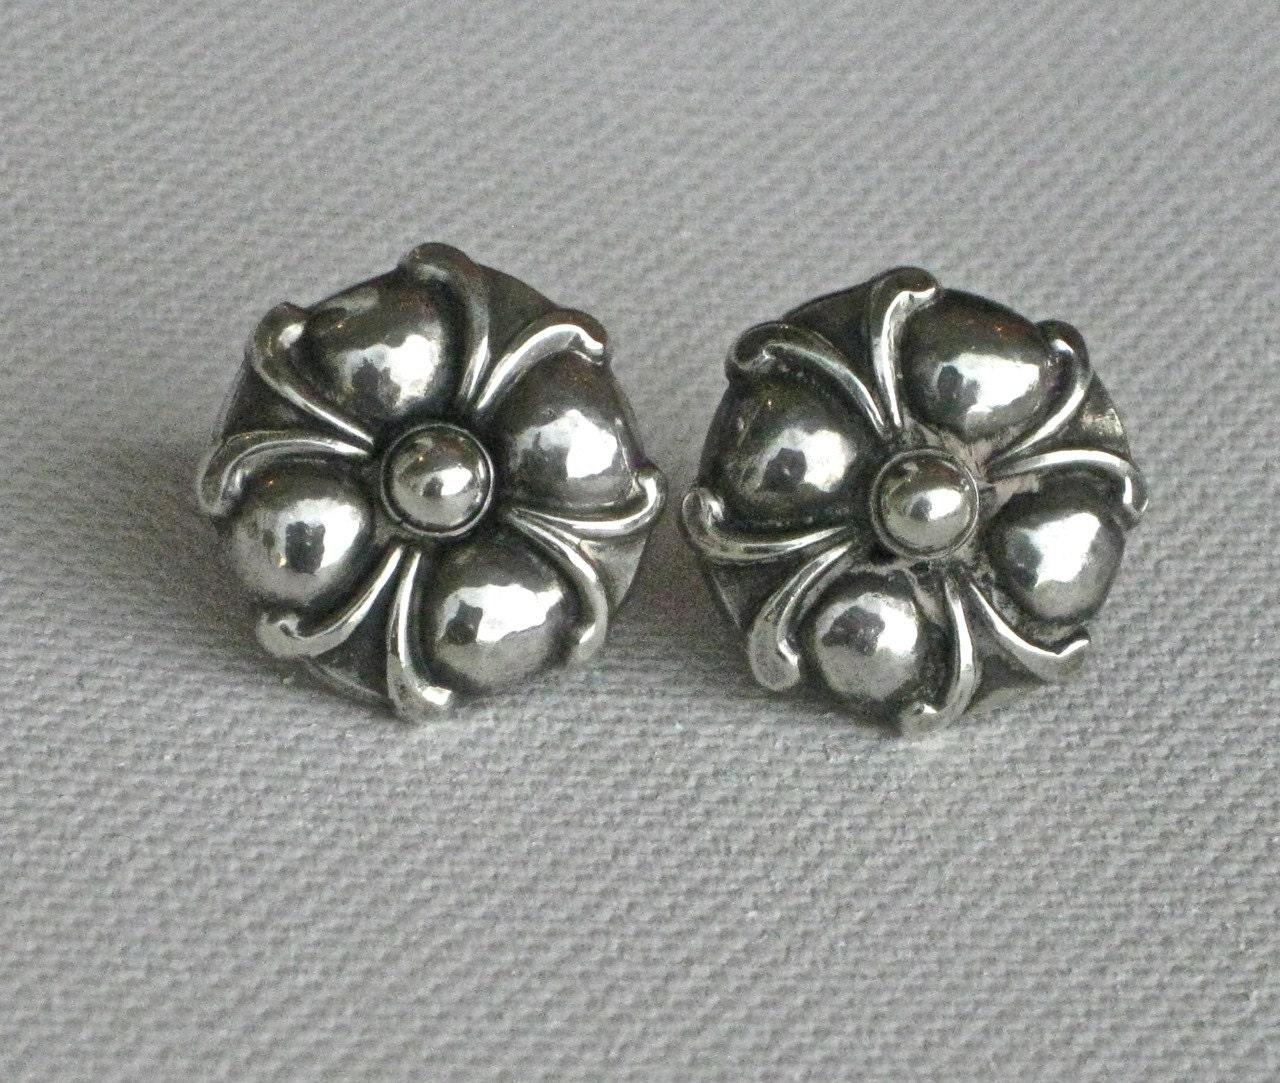 sale classic vintage georg jensen sterling earrings with. Black Bedroom Furniture Sets. Home Design Ideas